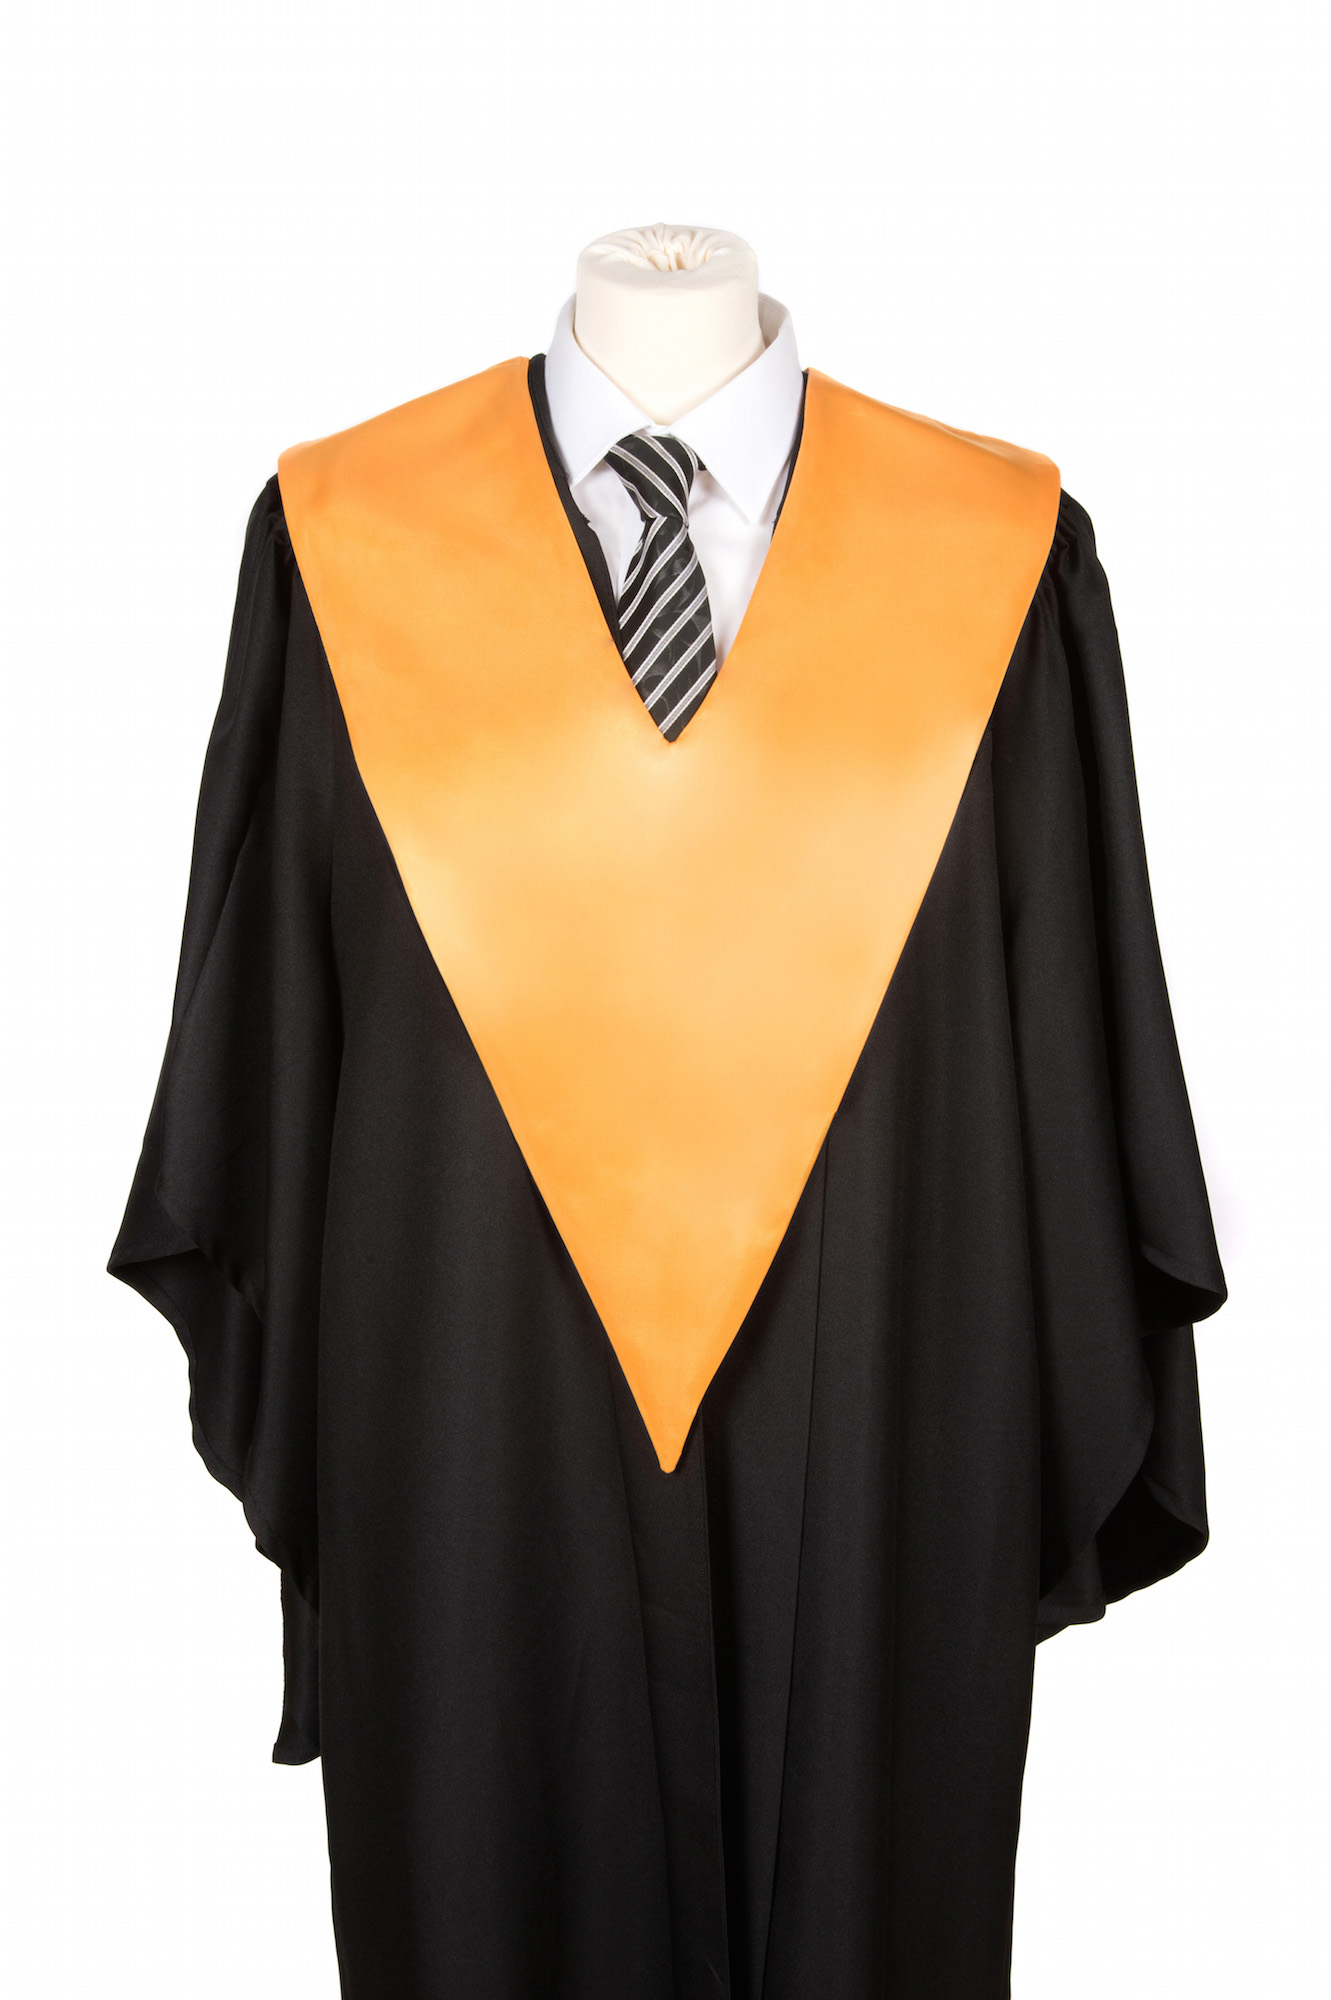 V-Stole - Graduation Gowns | Graduation Attire